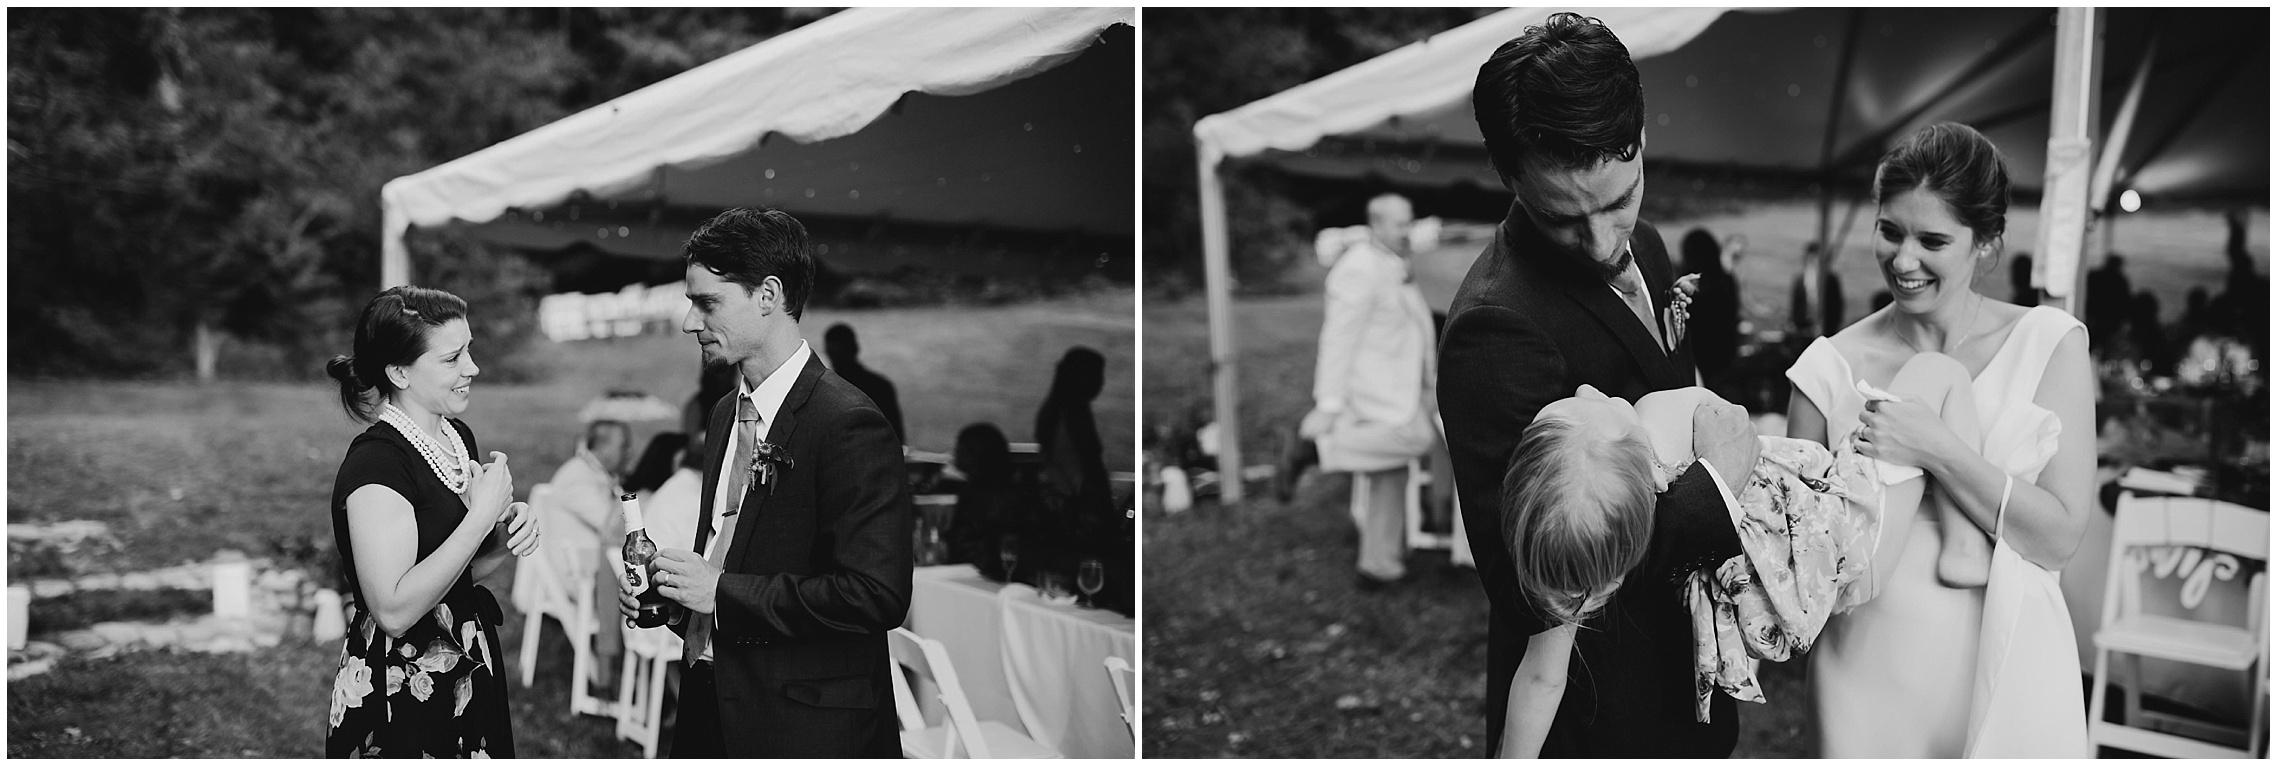 rock_creek_gardens_washington_wedding_photographer_0348.jpg